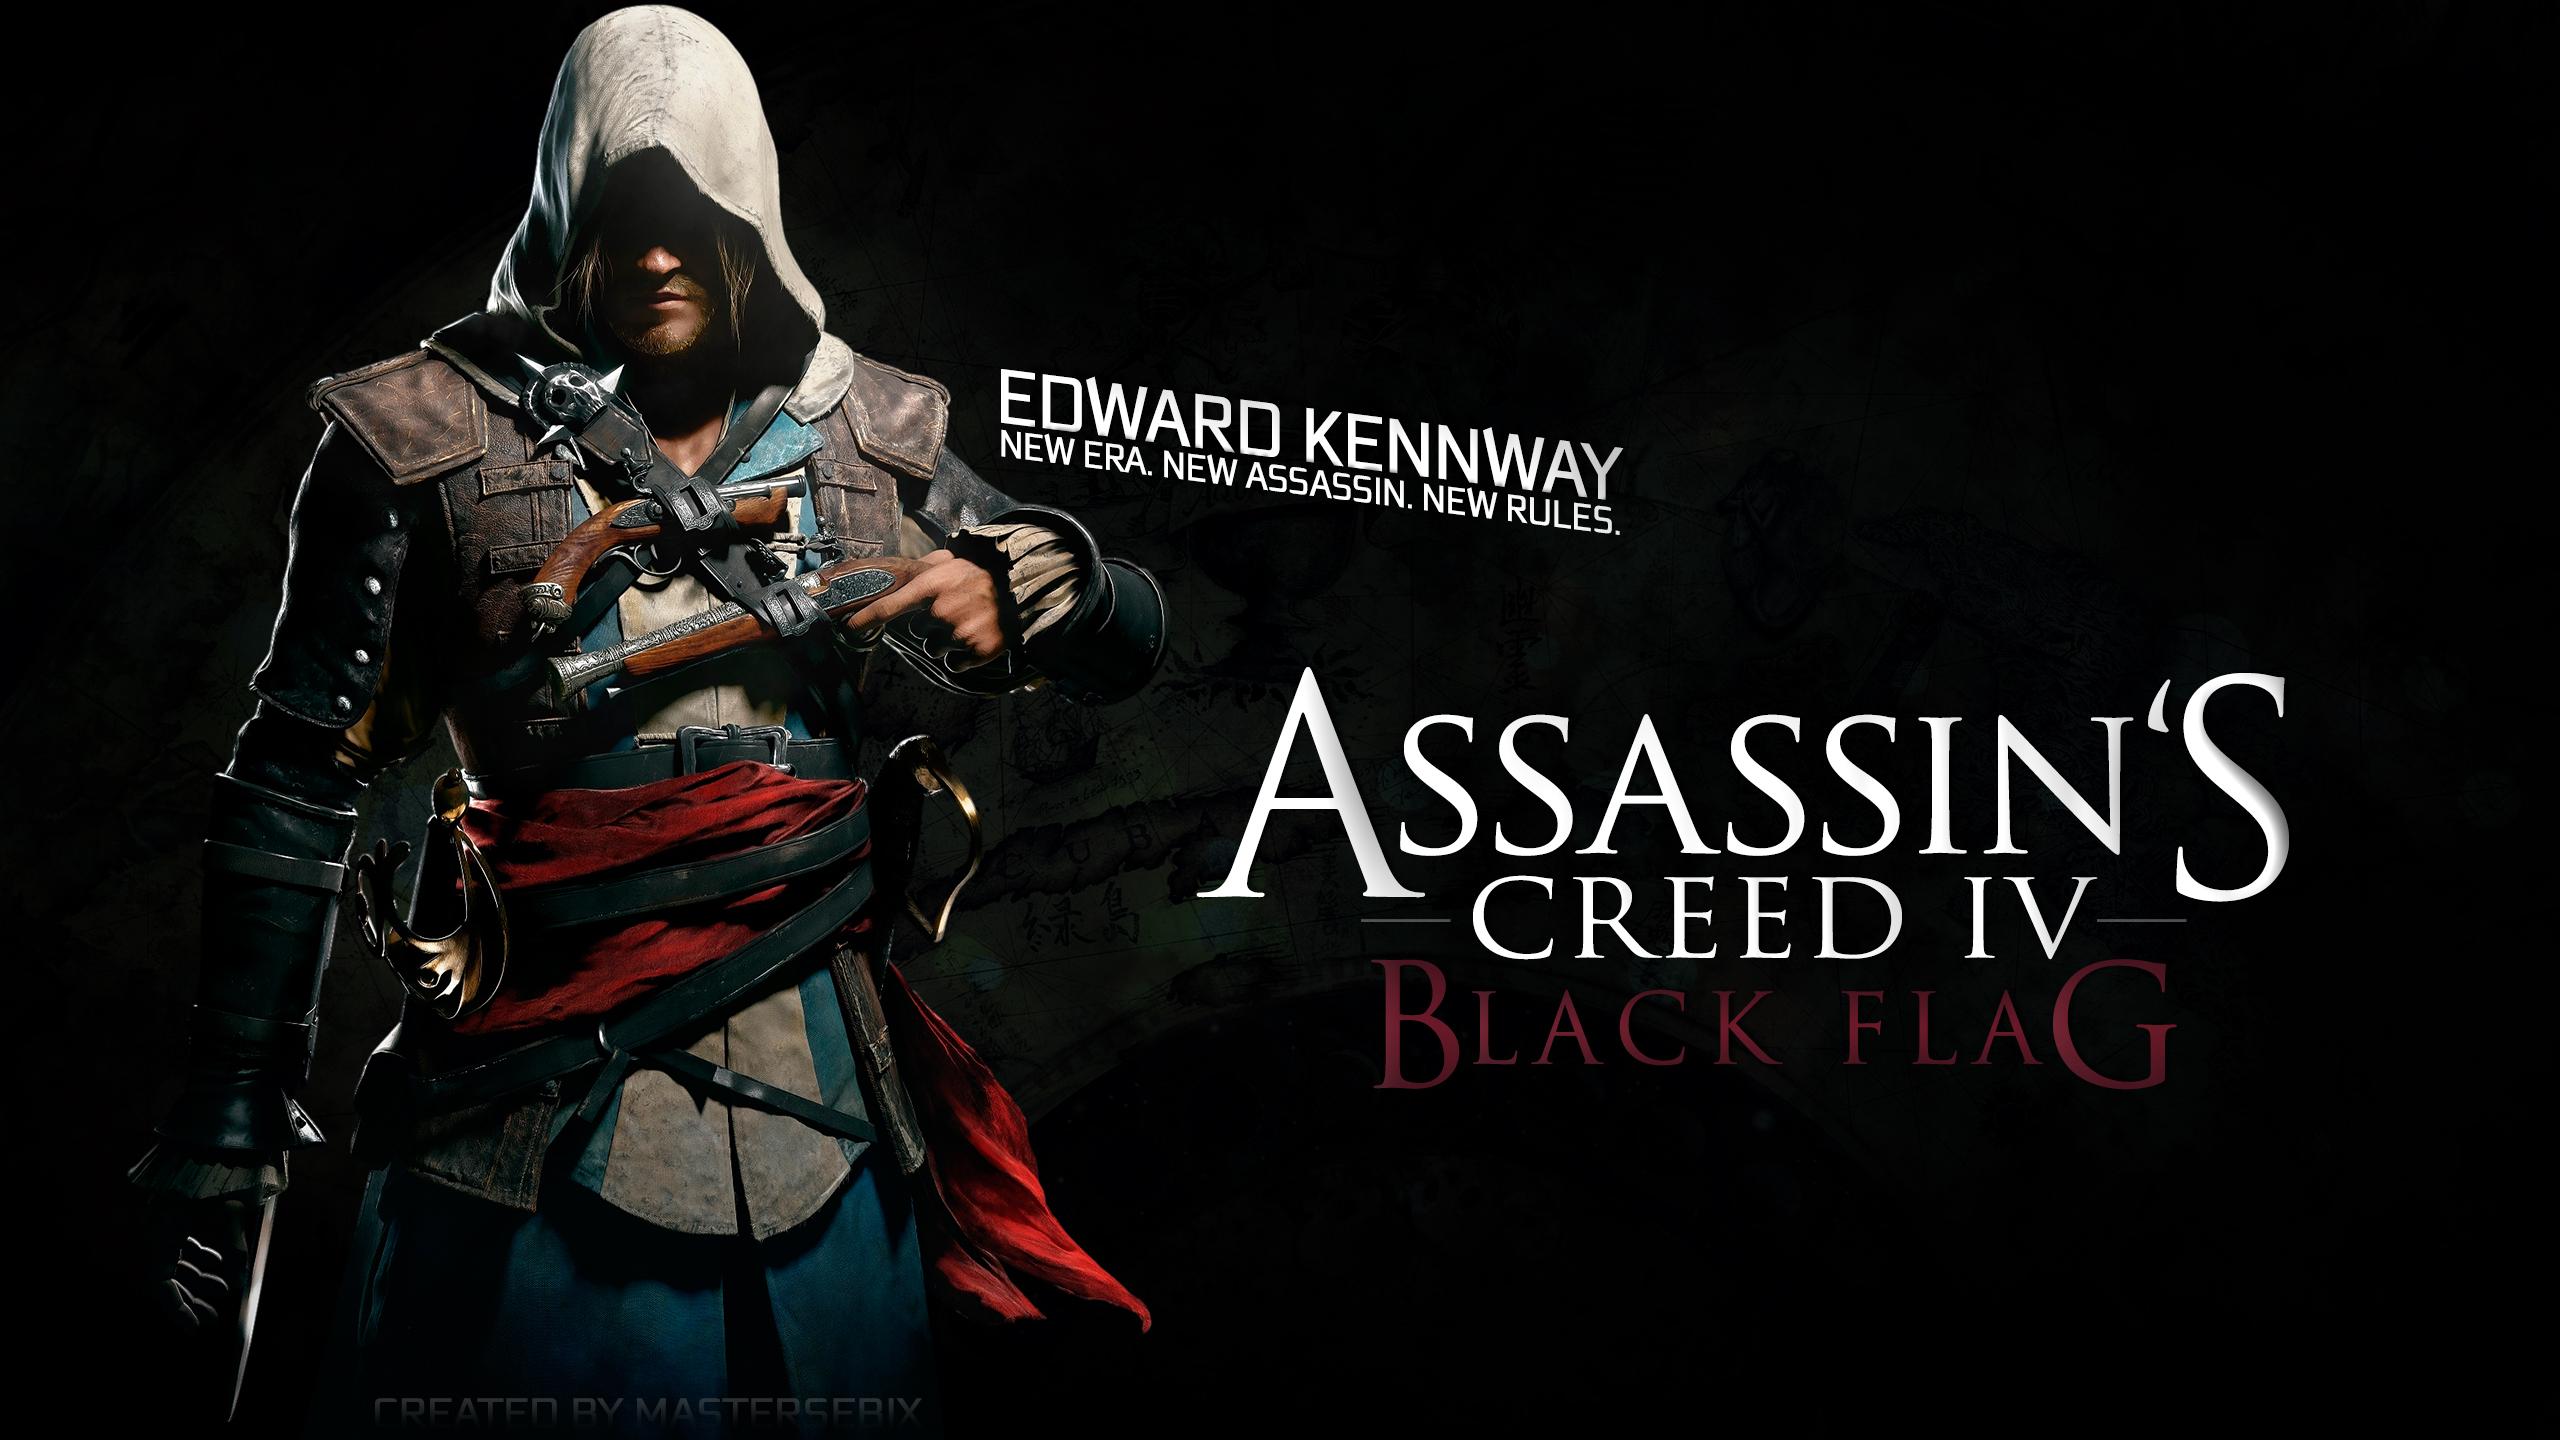 Free Download Assassins Creed Black Flag Wallpaper Widescreen